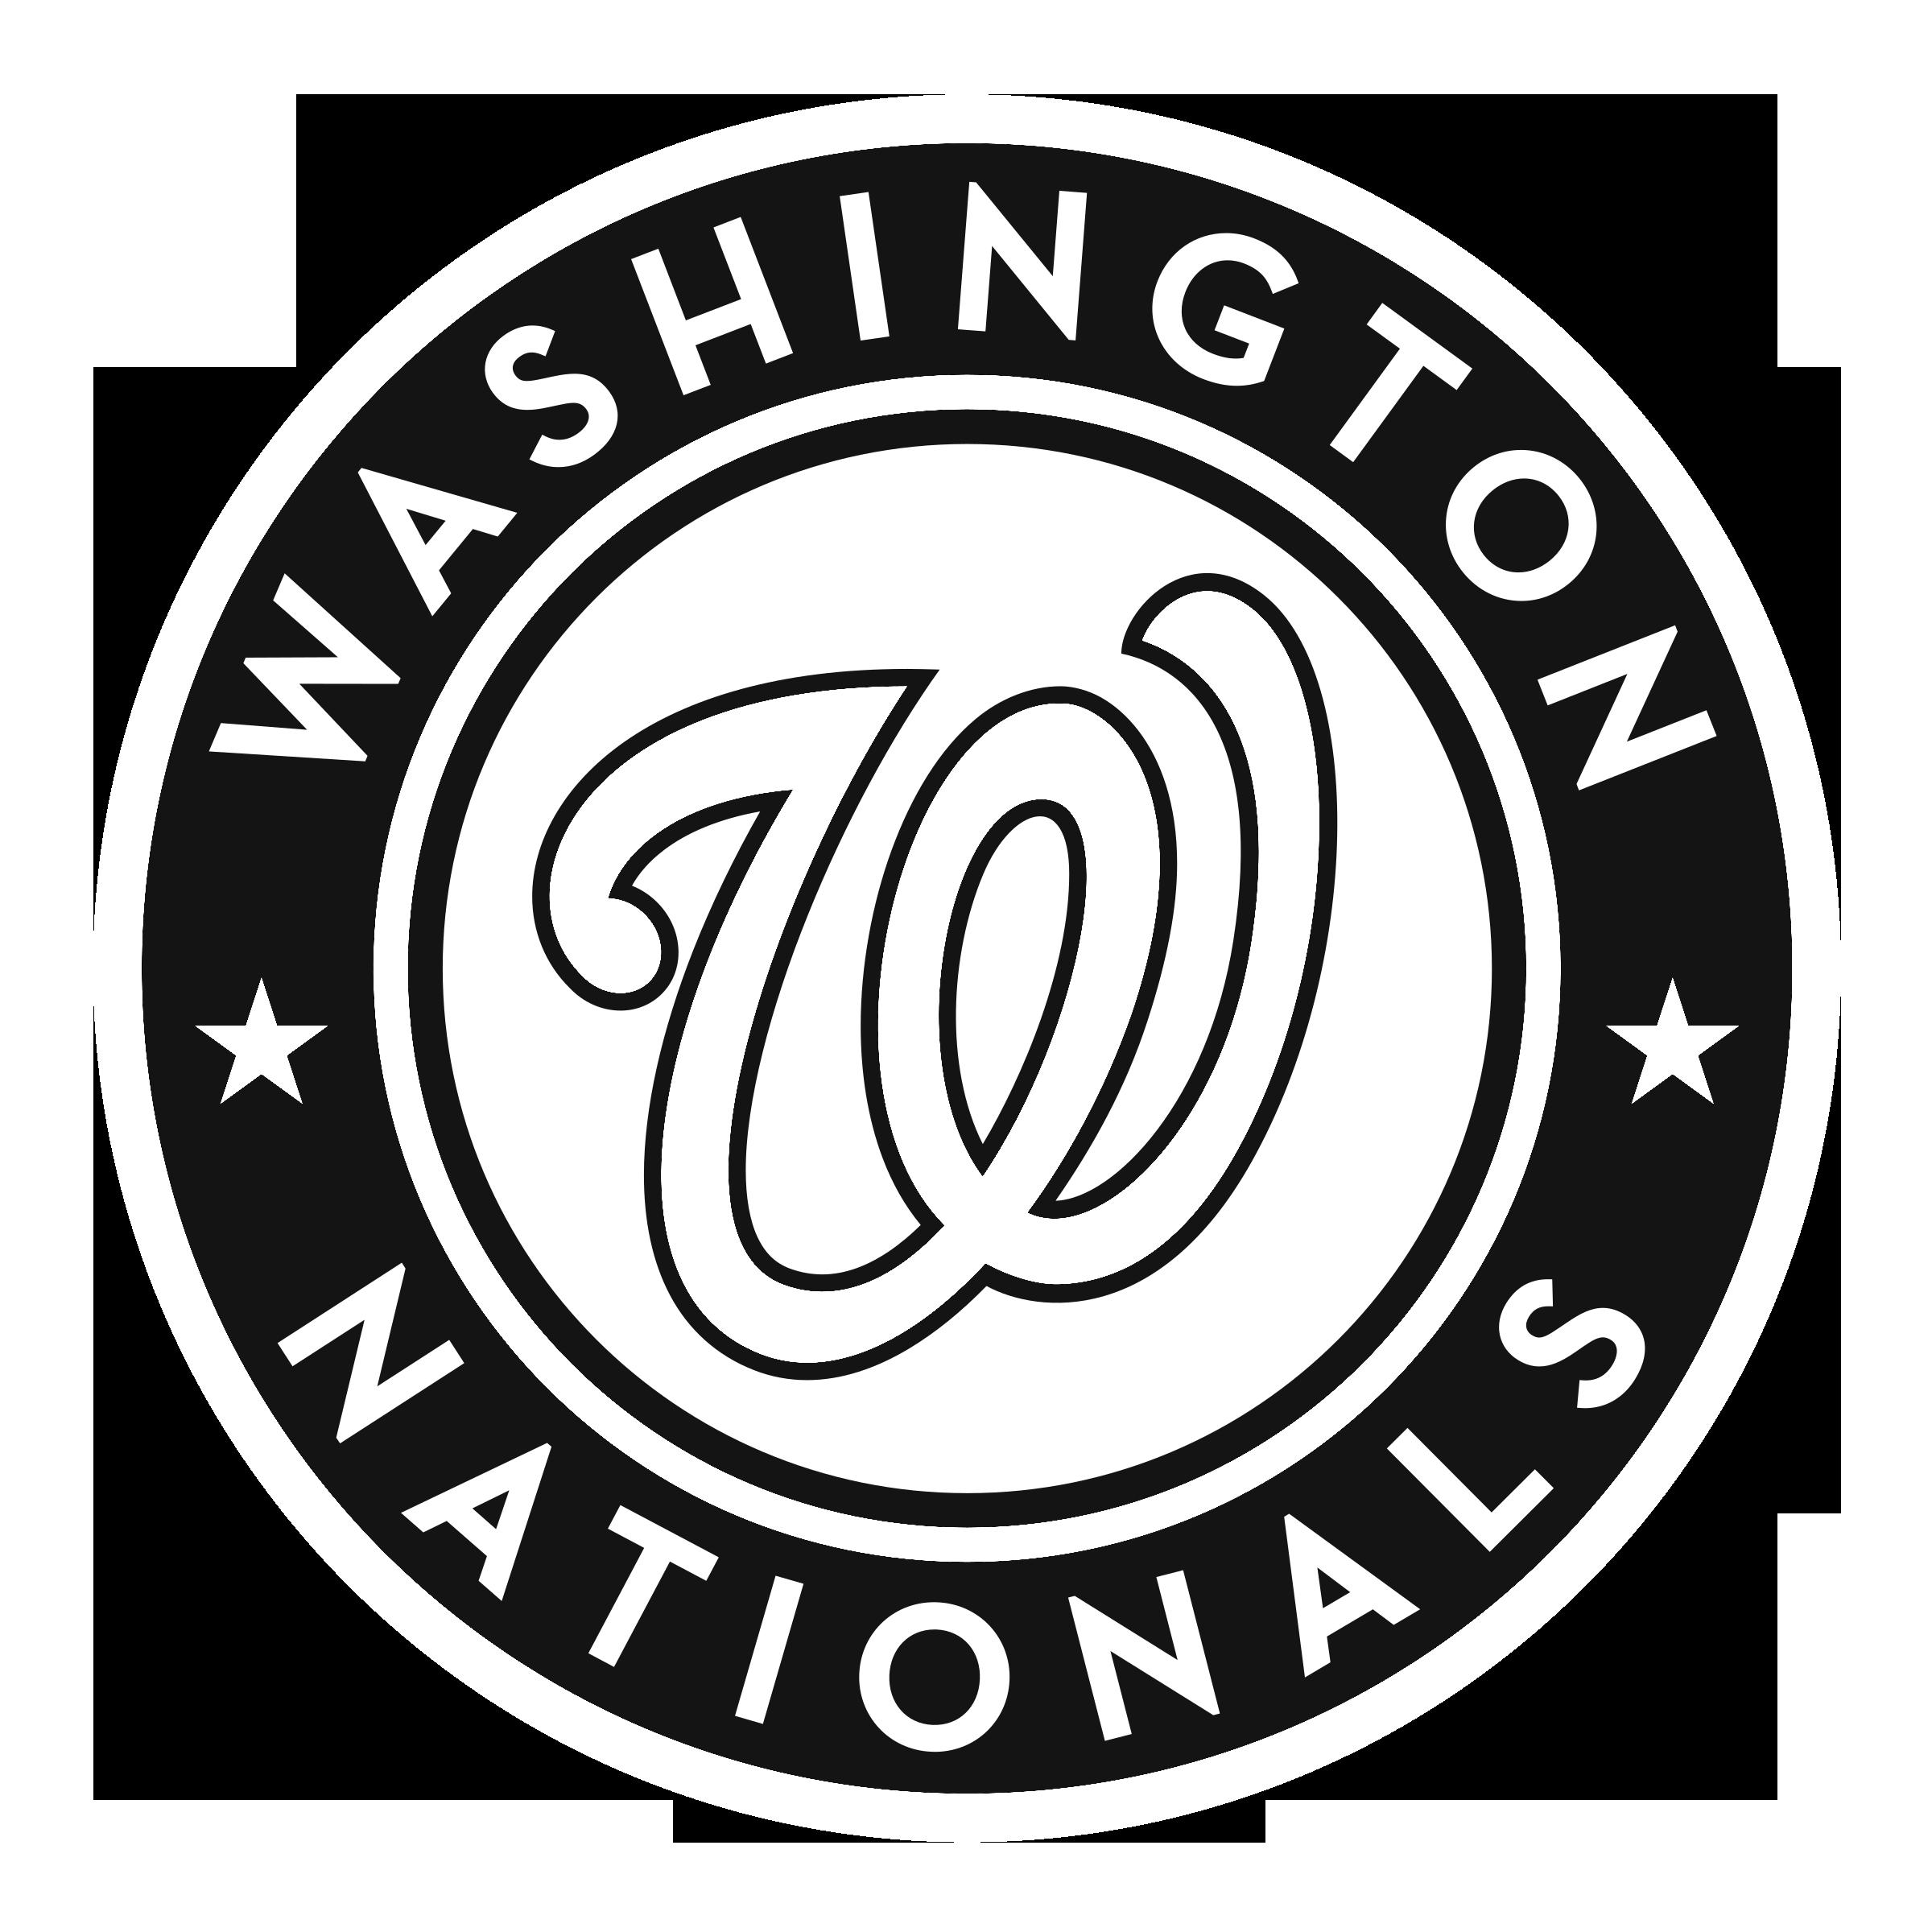 Baseball logo clipart free black and white clipart royalty free Washington, D.C. Washington Nationals Chicago Cubs MLB Baseball ... clipart royalty free